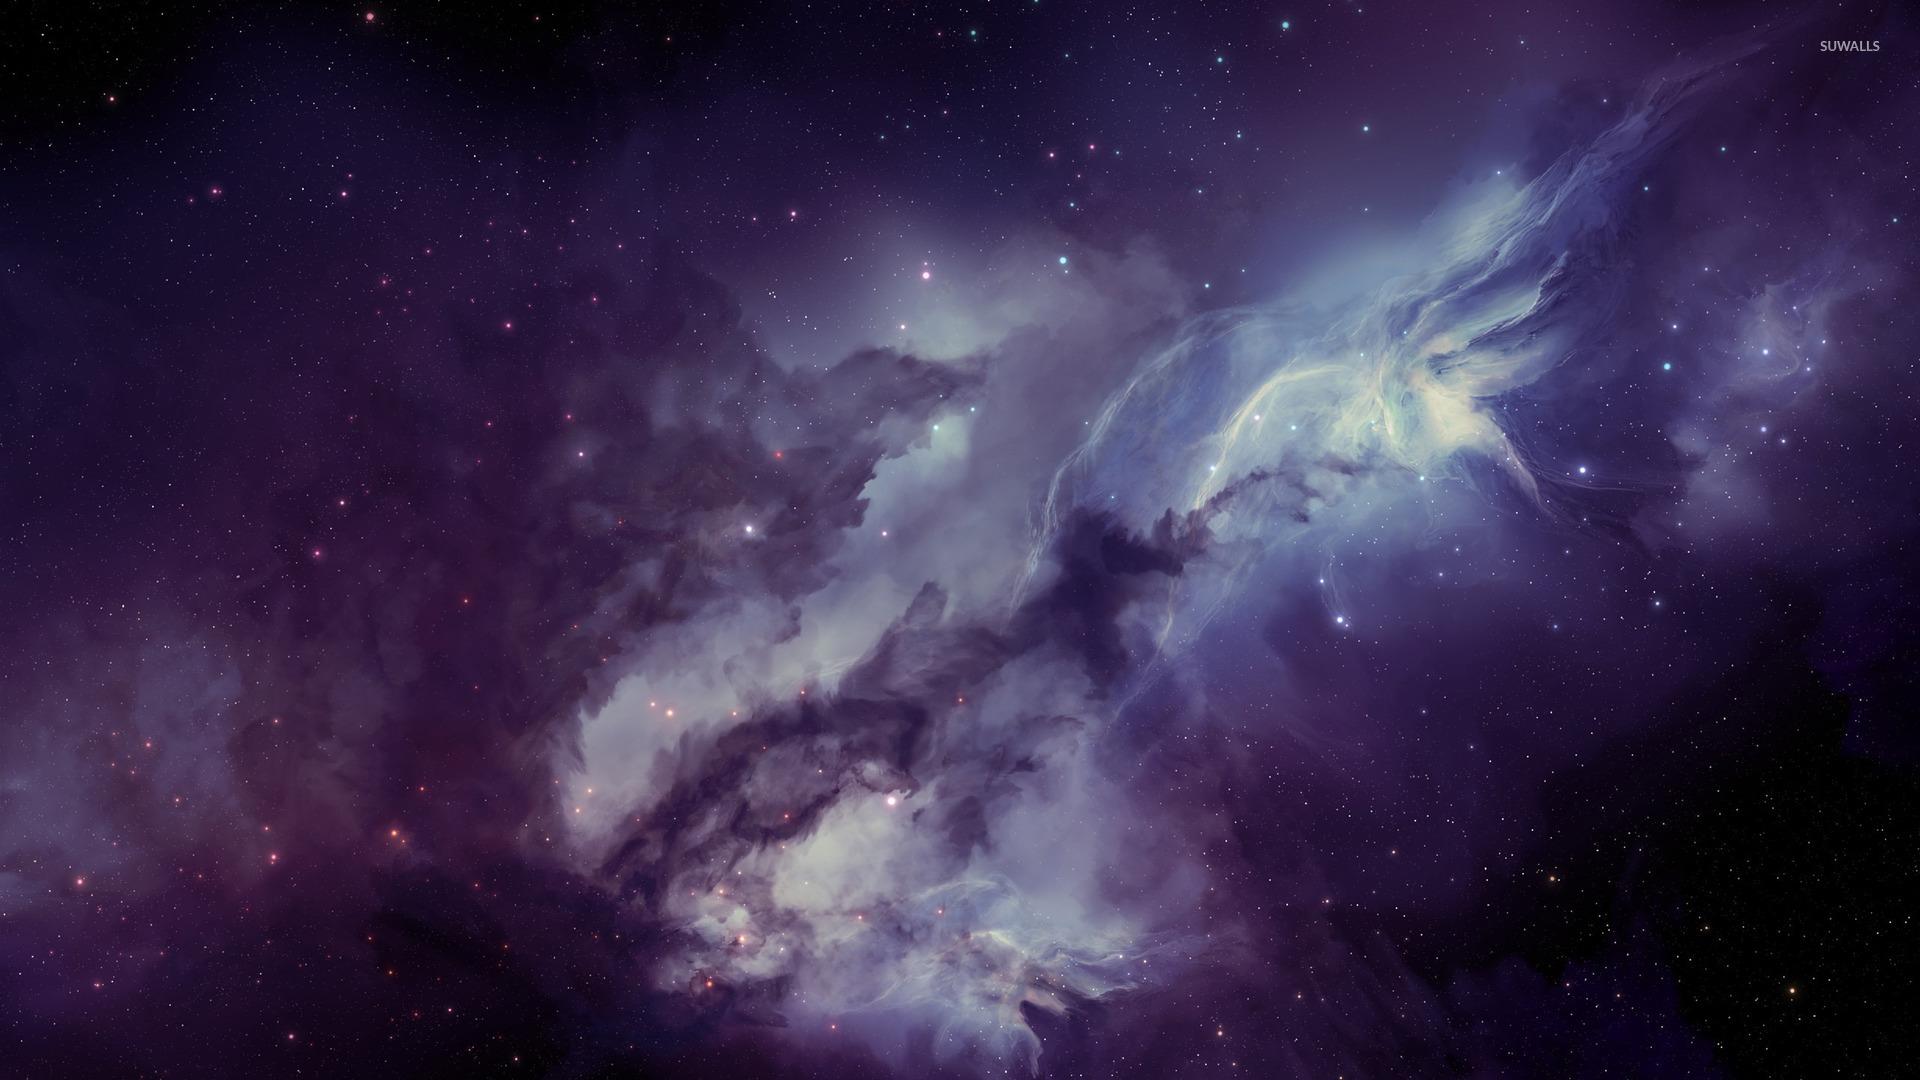 Nebula wallpaper   Space wallpapers   15874 1920x1080